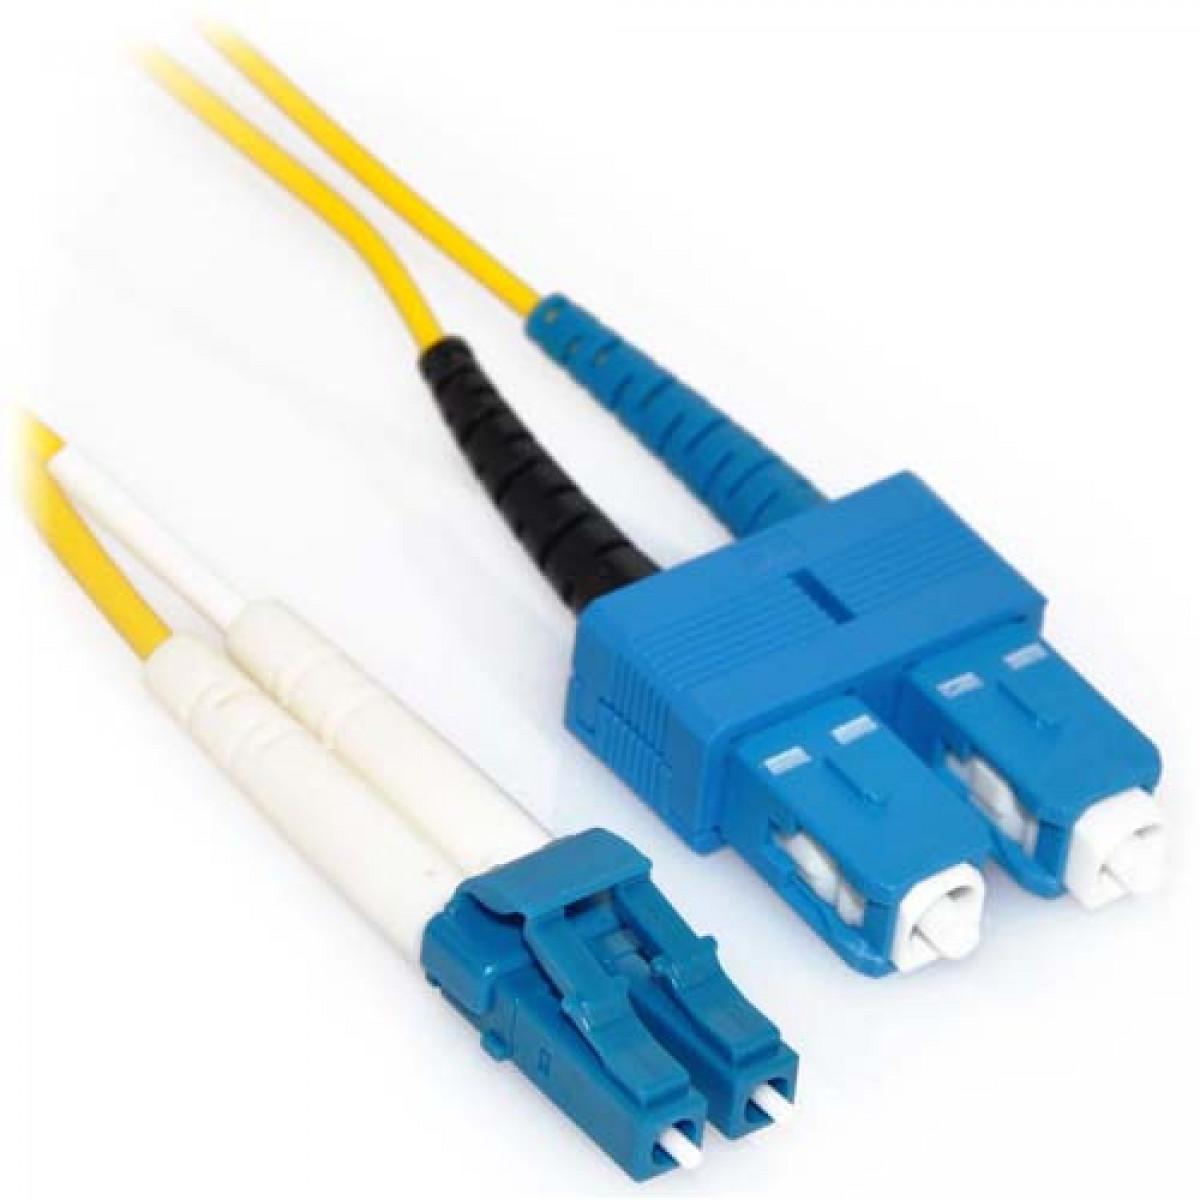 40m Lc Sc 12 Strand Plenum Singlemode 9 125 Fiber Cable